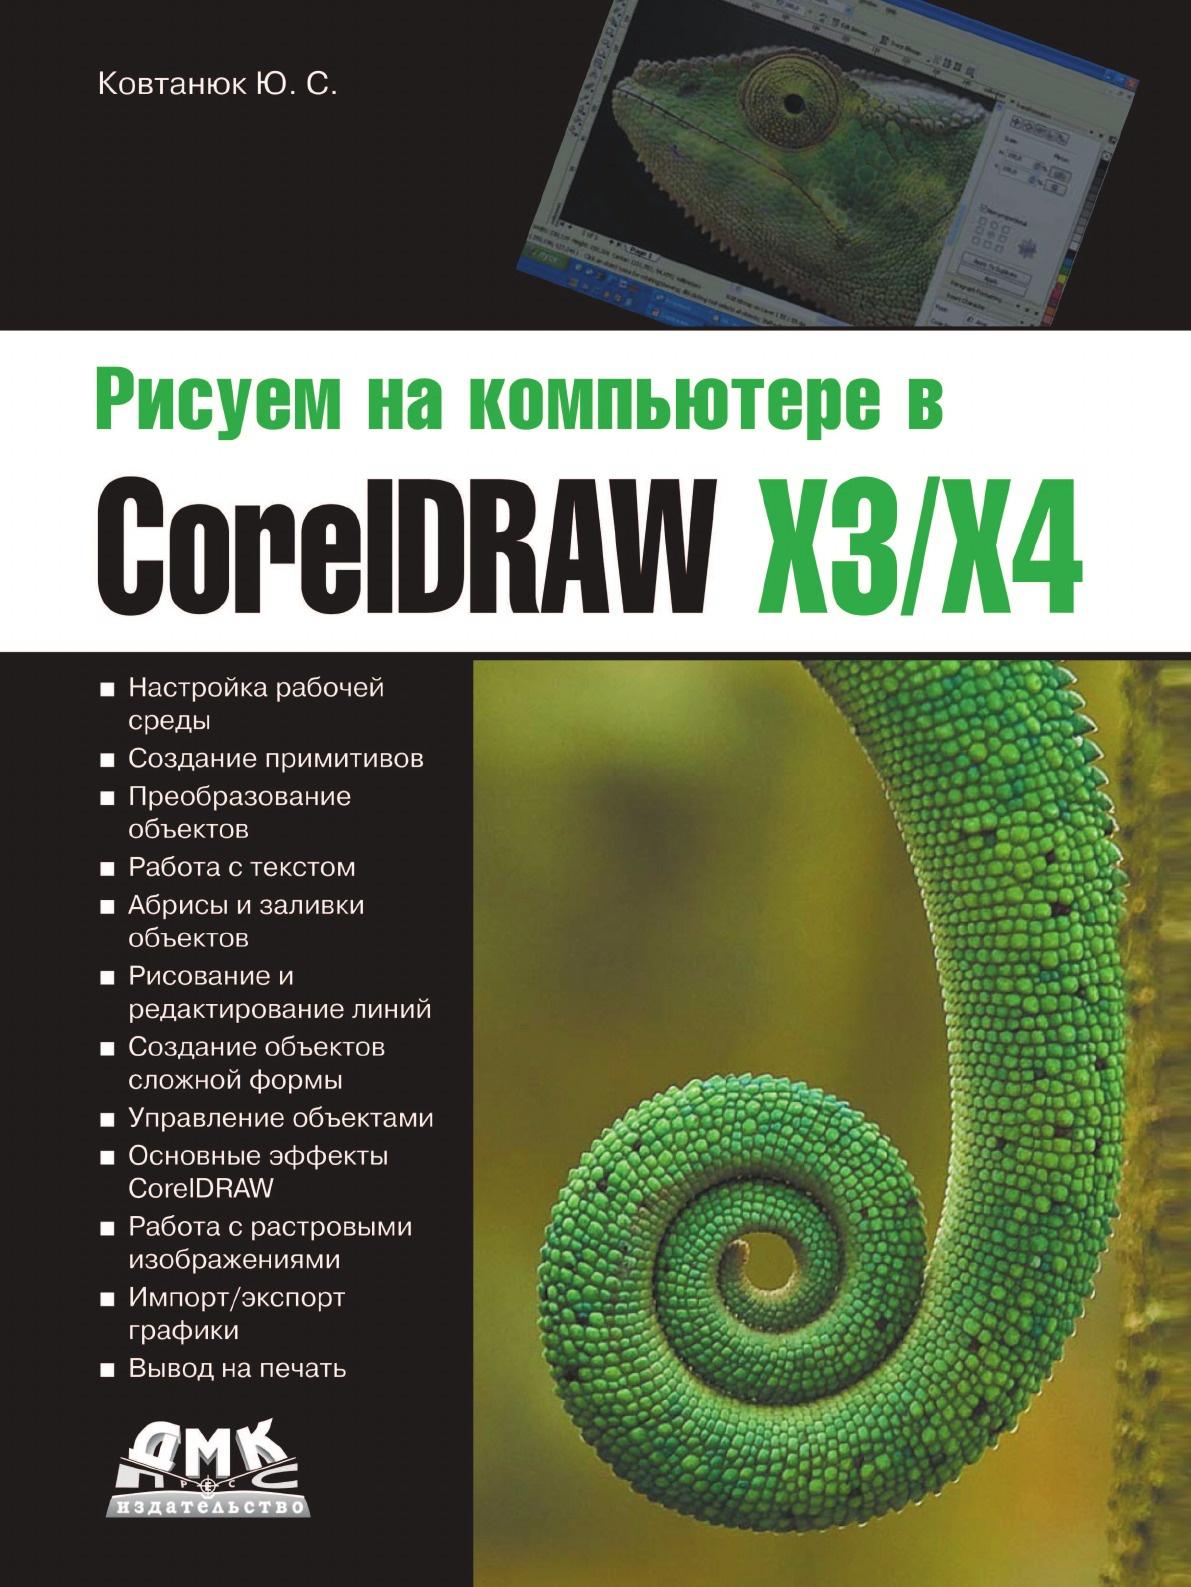 Ю.С. Ковтанюк Рисуем на компьютере в CorelDraw X3/X4 макрос календарь для coreldraw x8